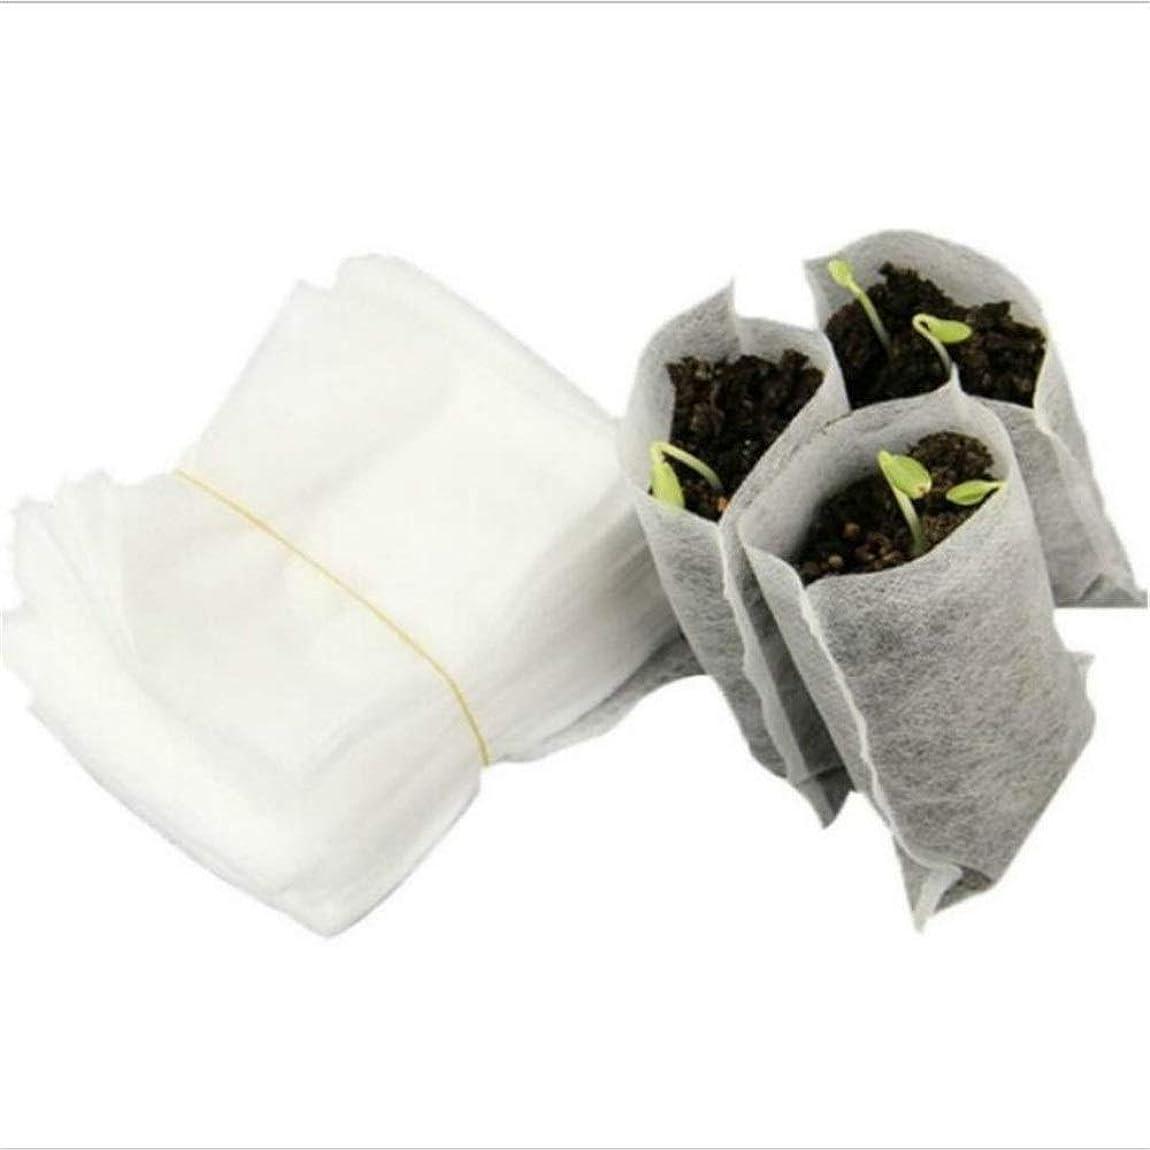 LVESHOP 100ピース不織布保育園バッグ植物成長バッグ生地苗ポット植物ポーチ